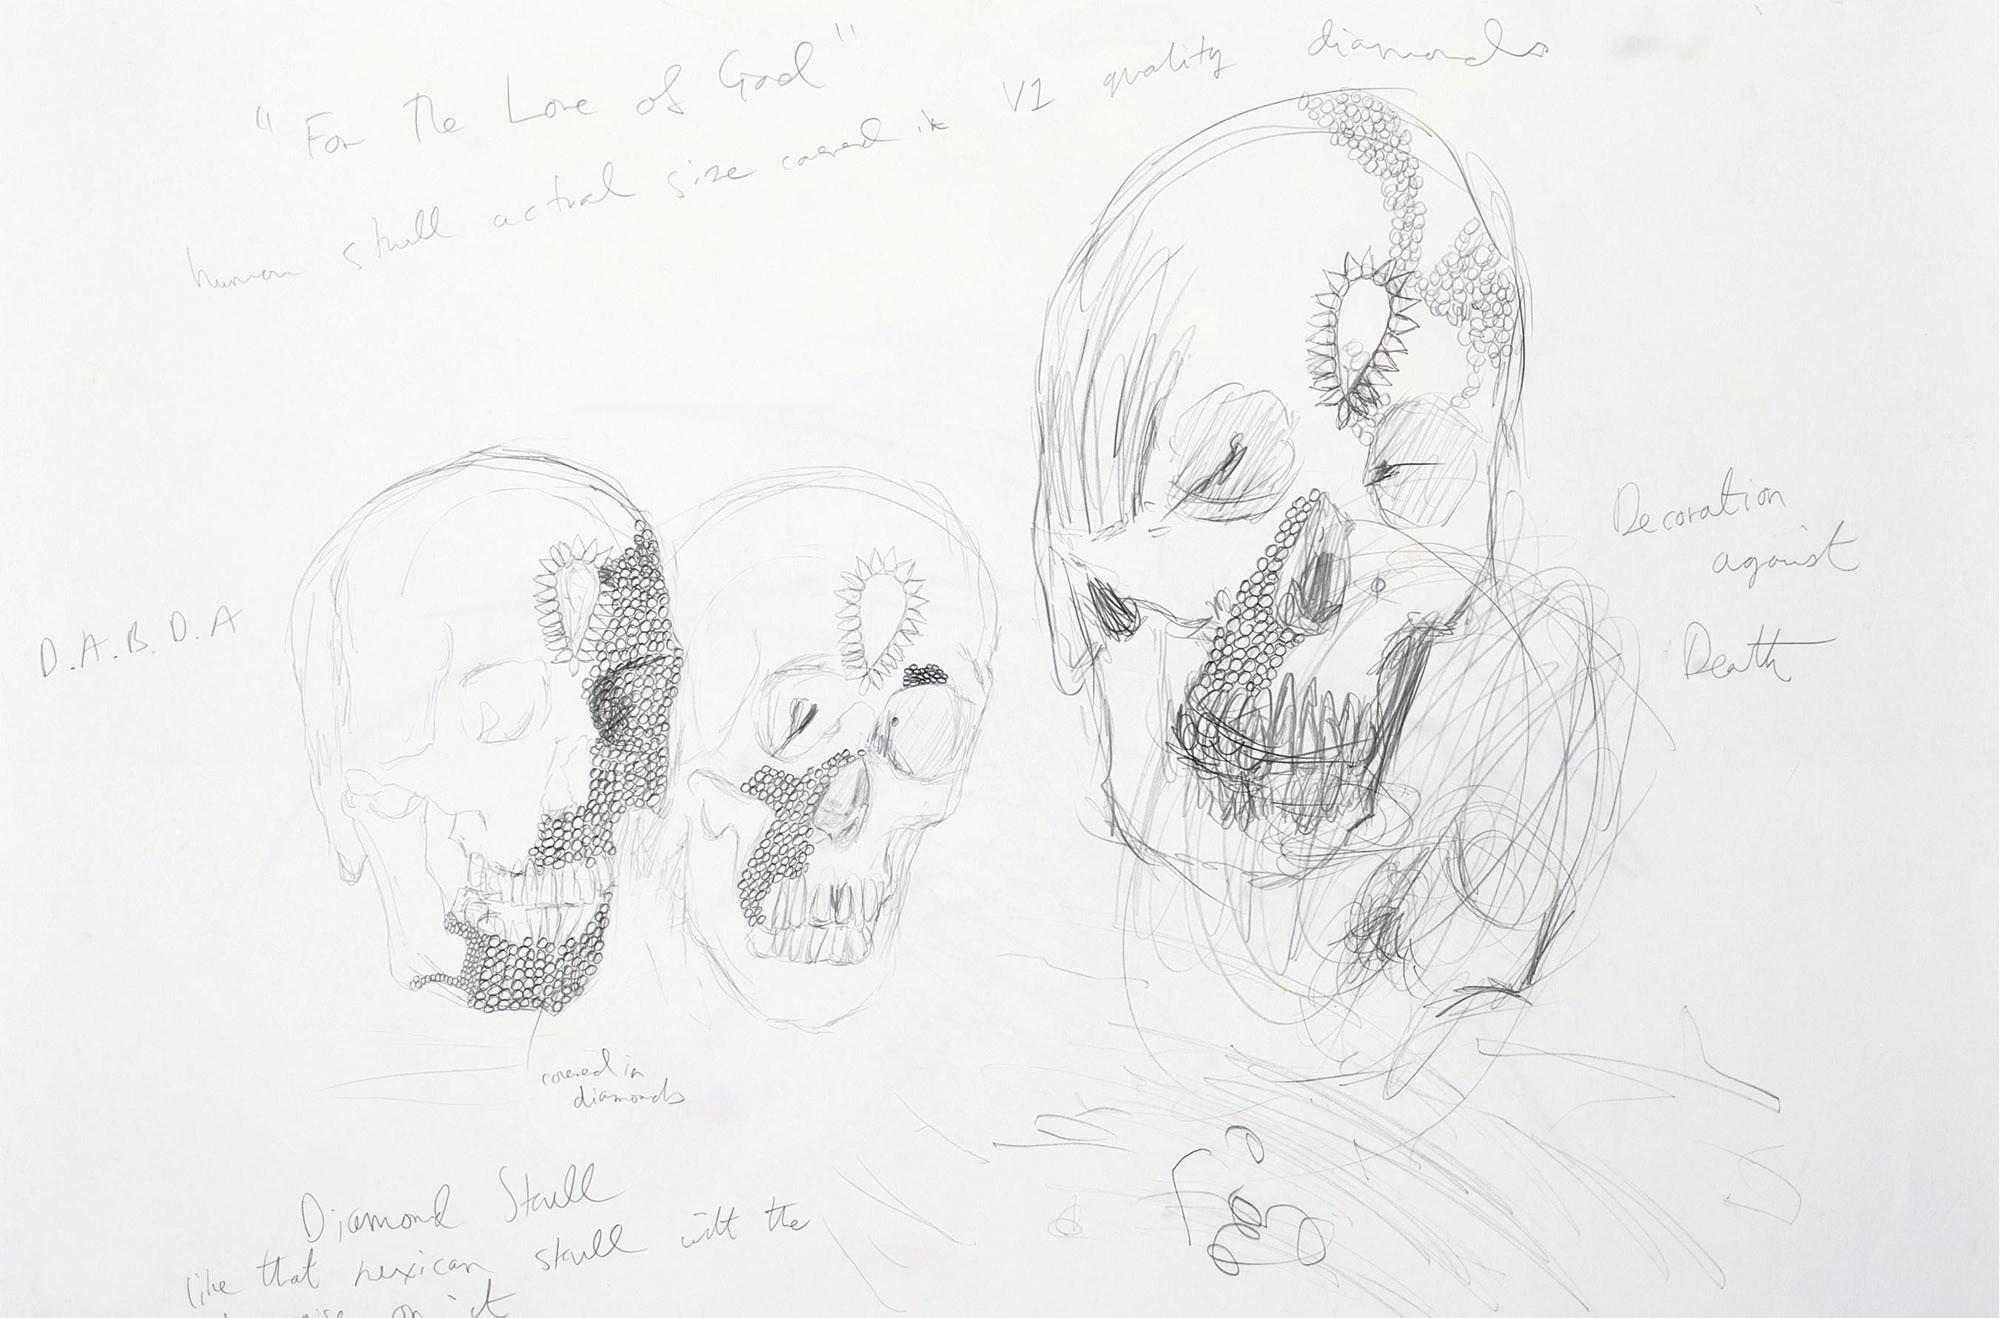 Damien Hirst (b. 1965)